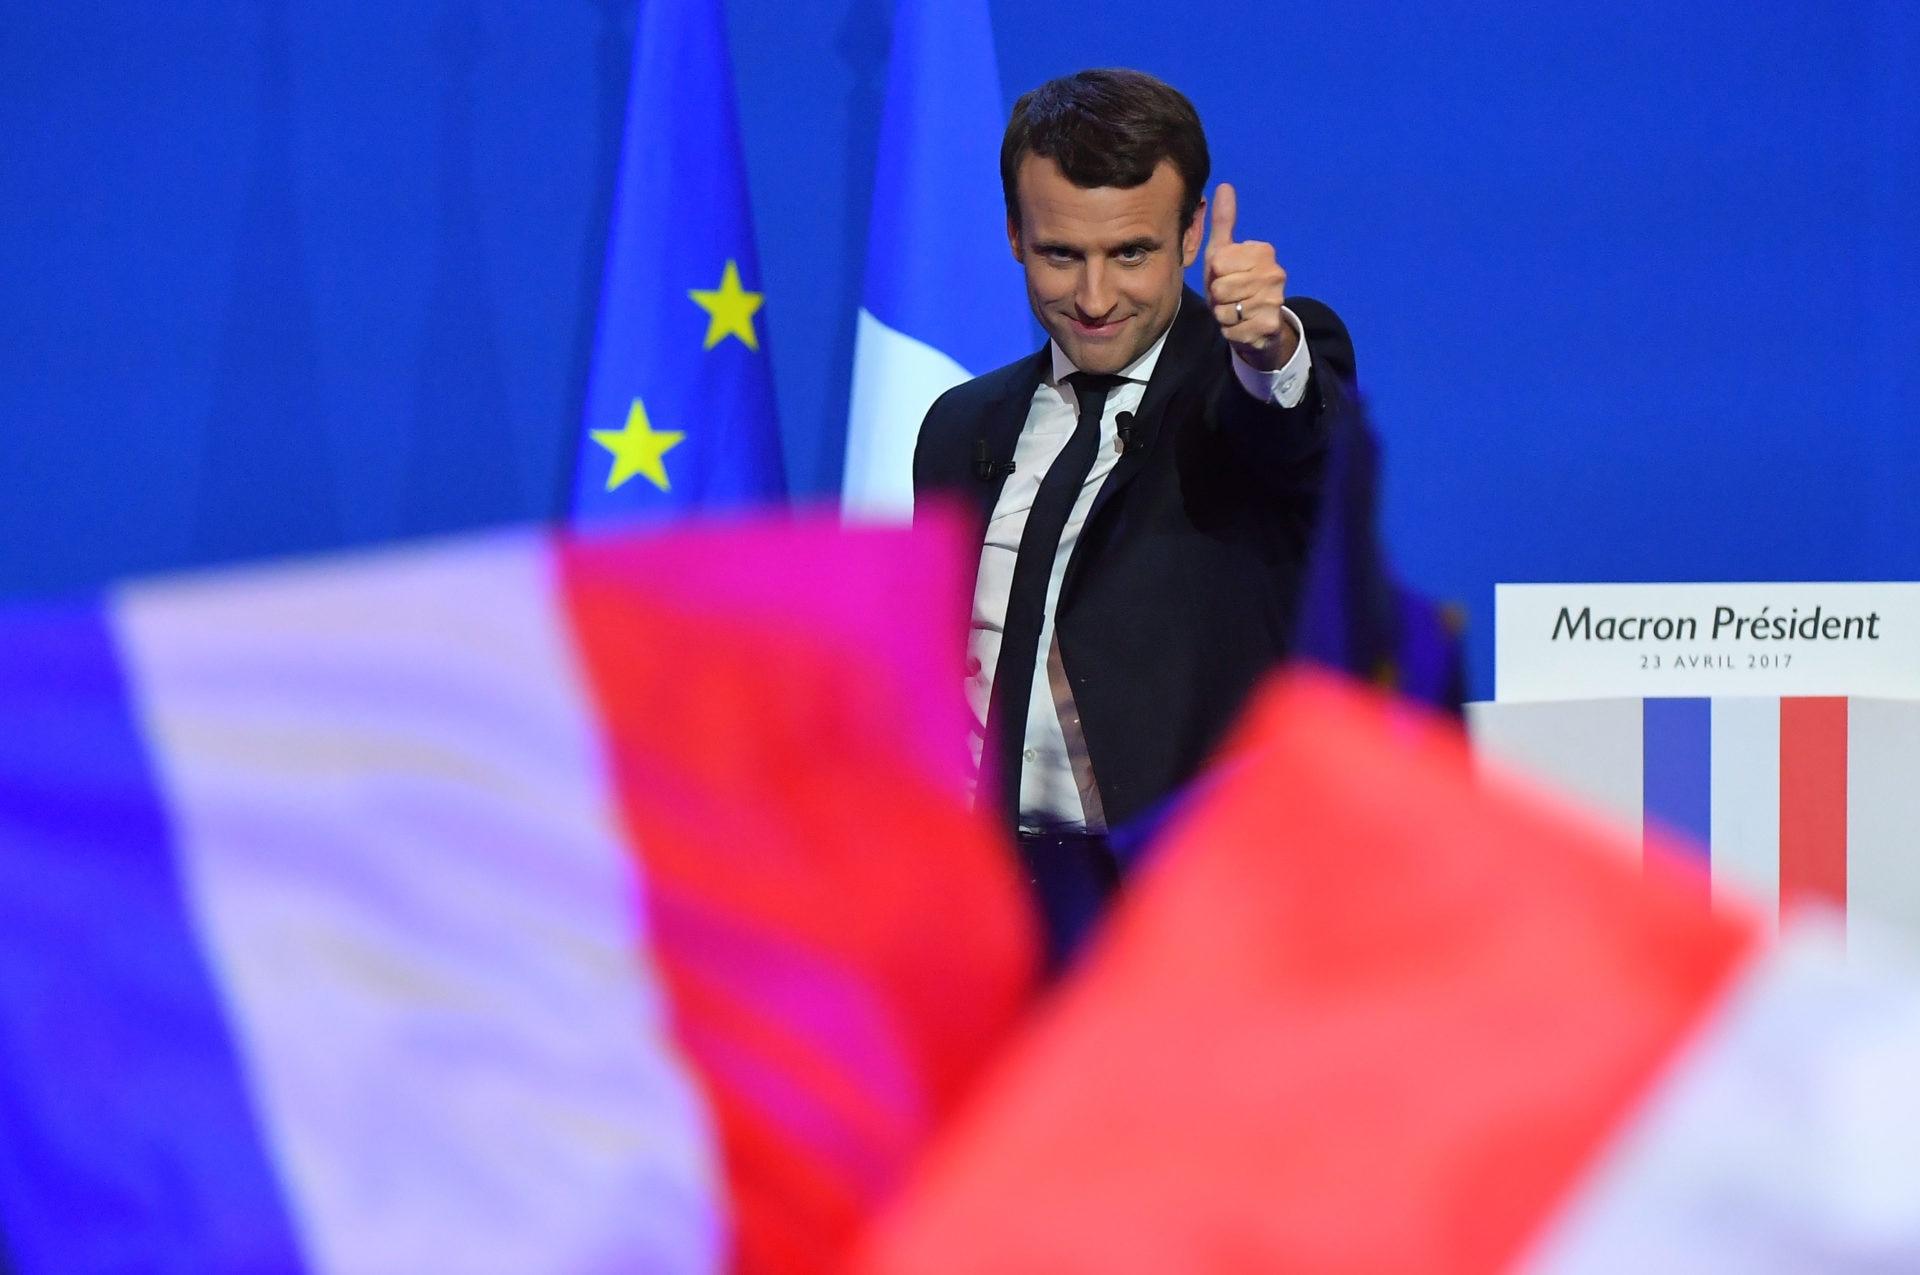 emmanuele-macron-francia-elecciones-efe-bbva-e1493024604244